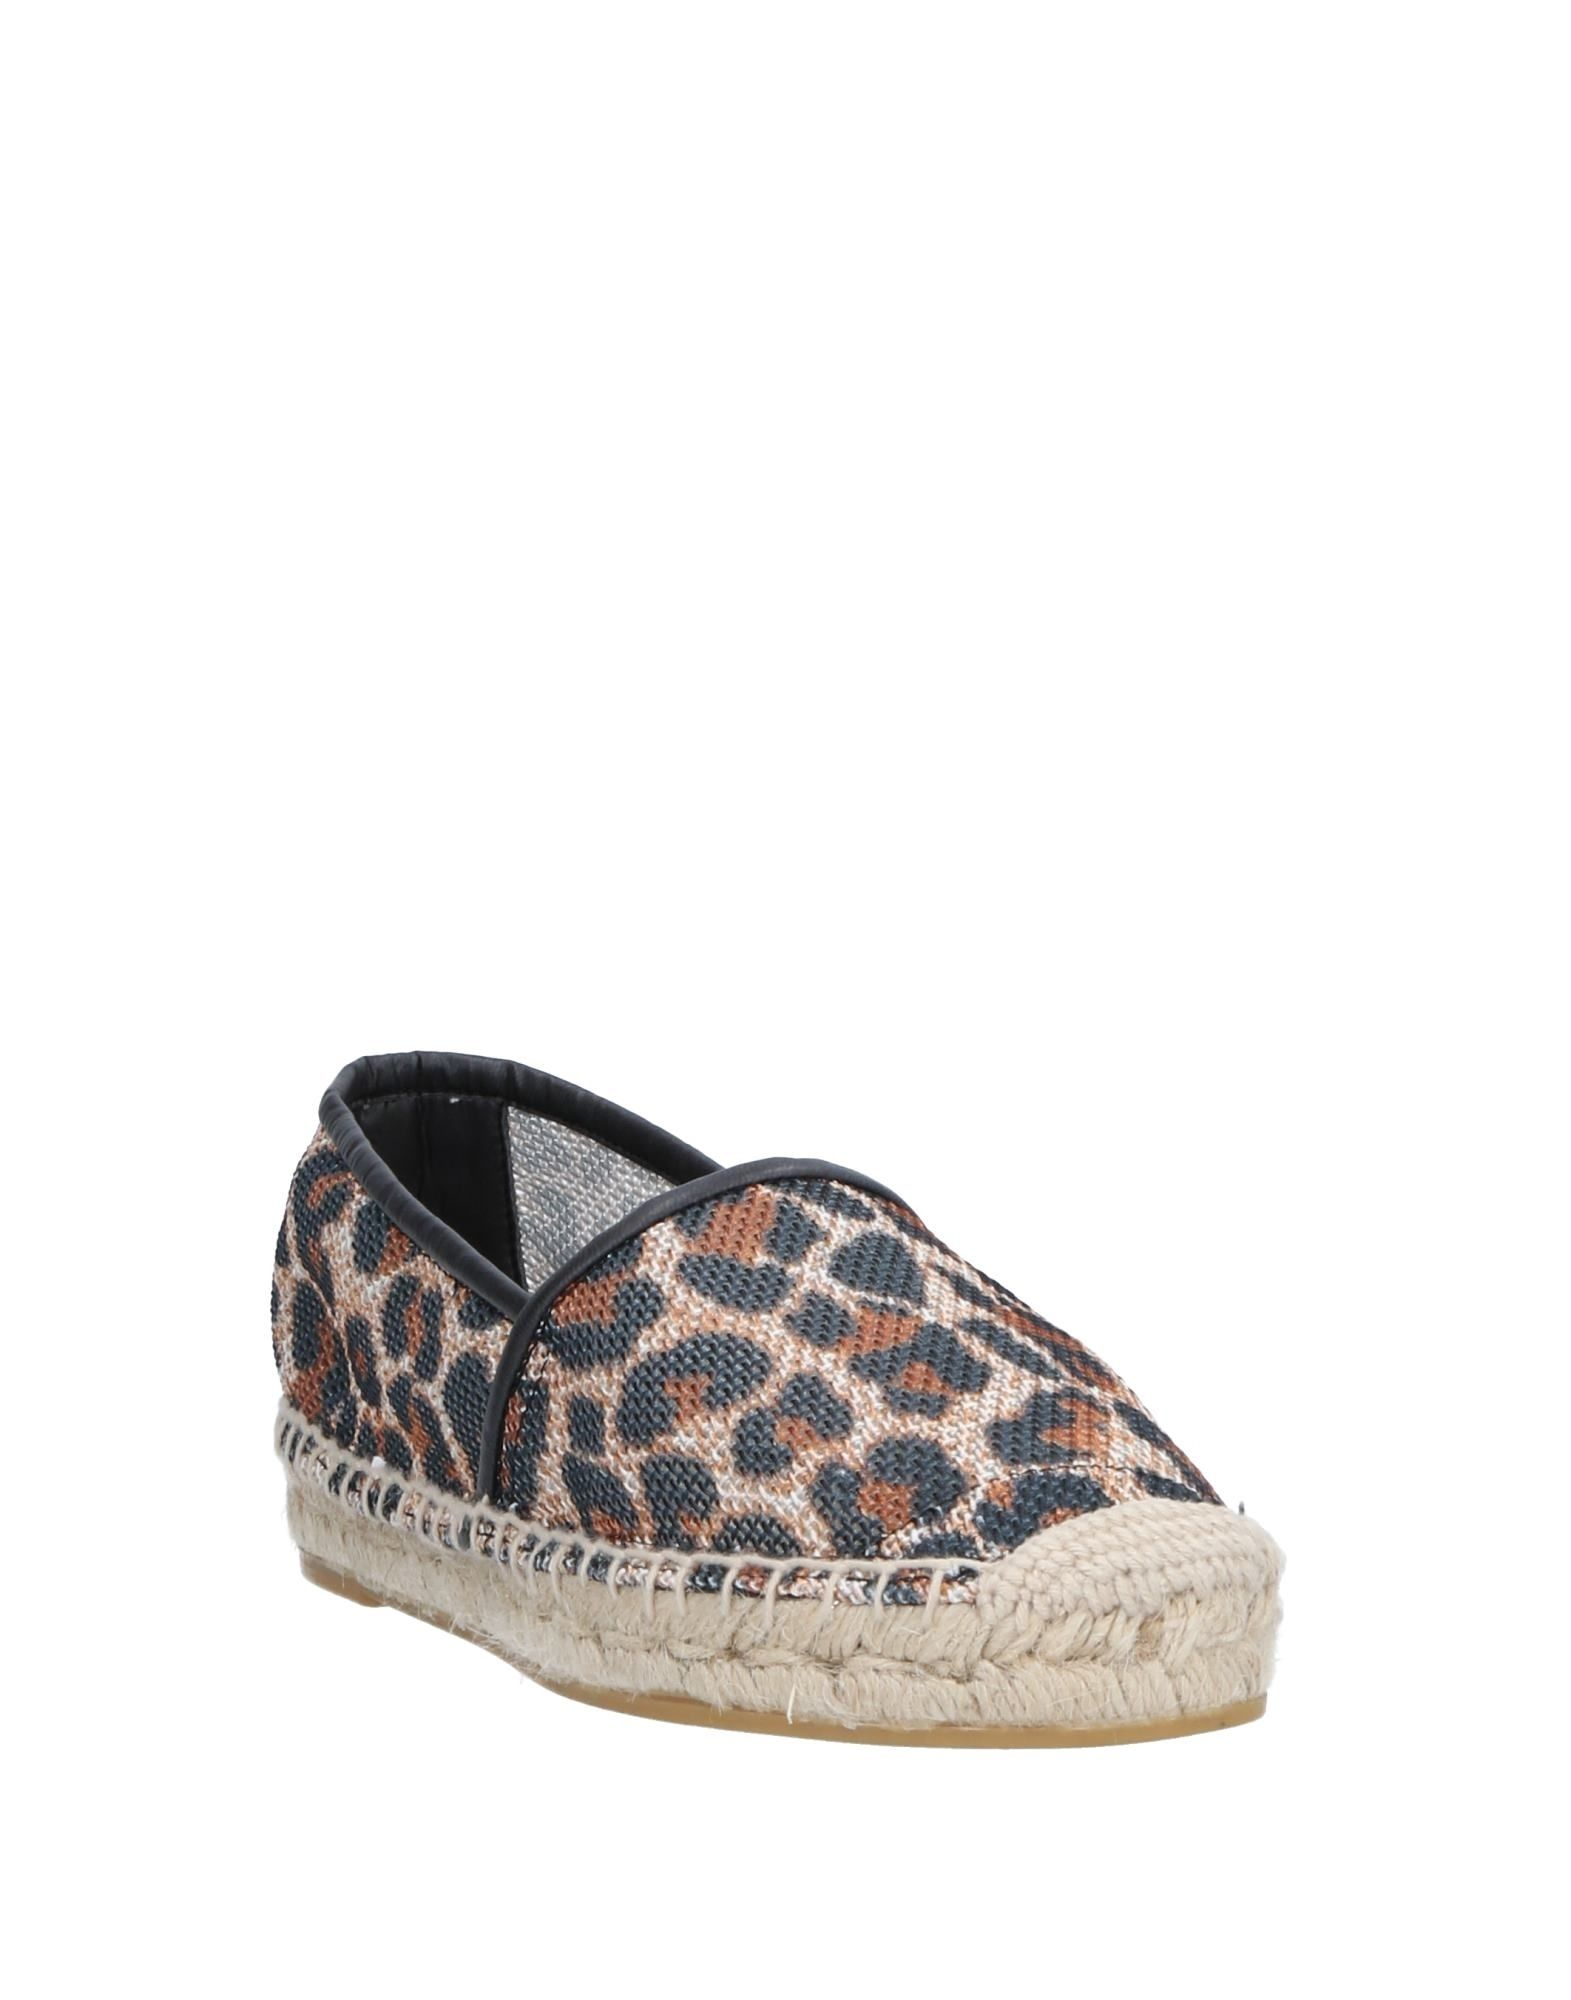 Sarah Summer Espadrilles Damen    11538235WE Neue Schuhe bfb35b